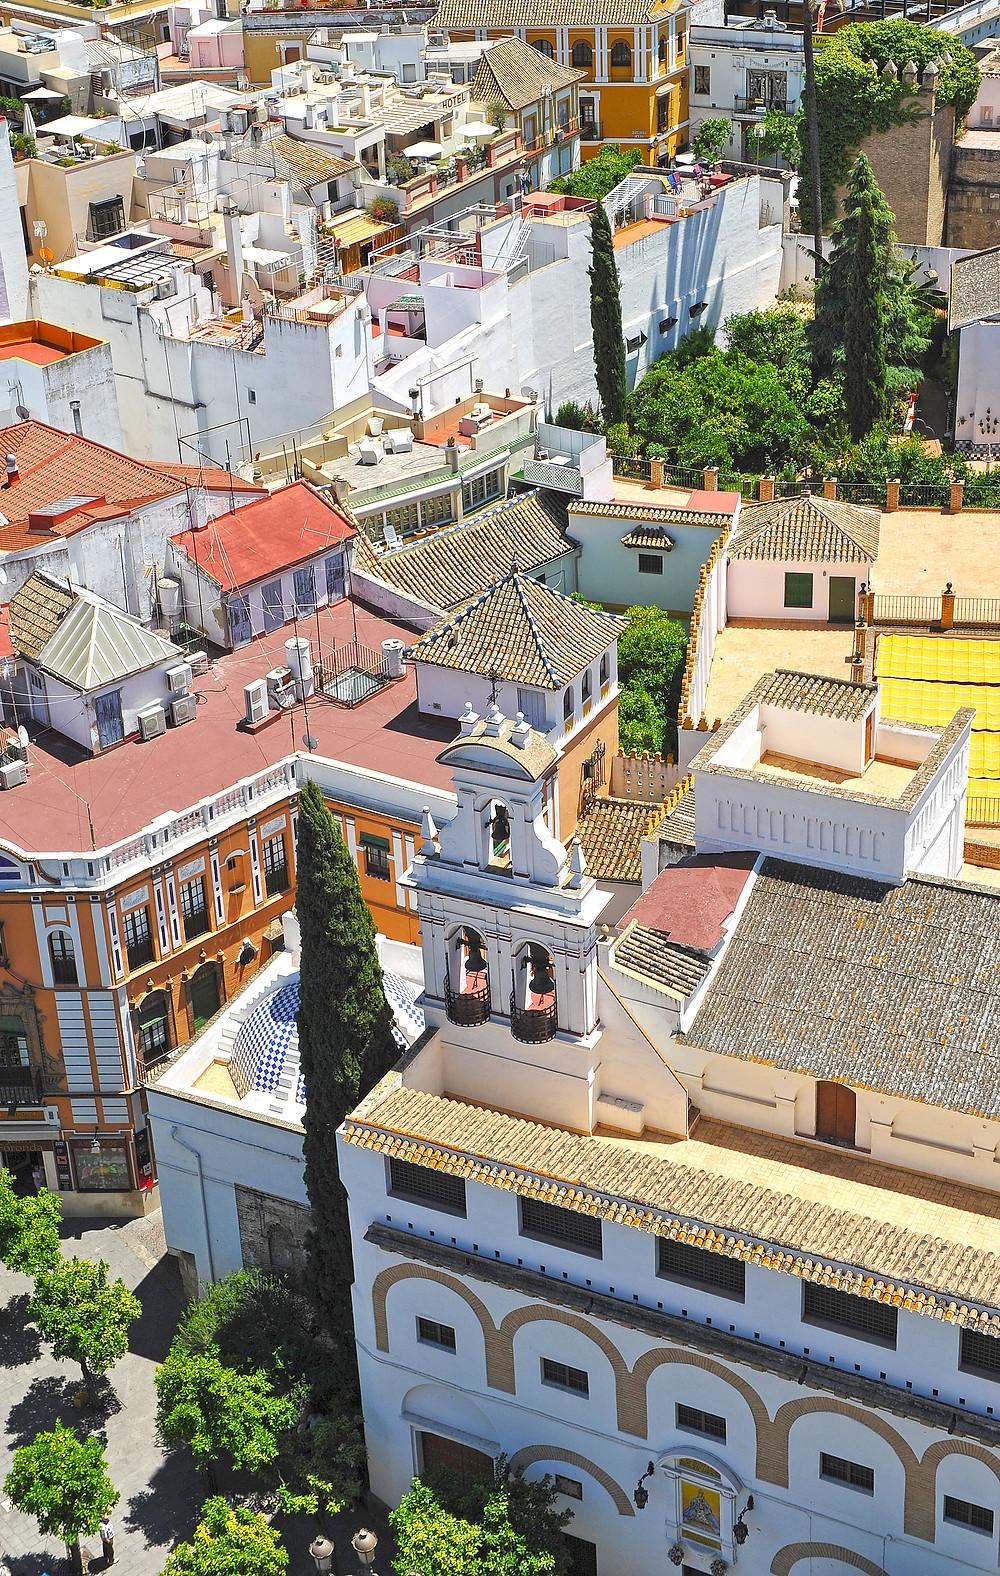 aerial view of Barrio Santa Cruz from La Giralda